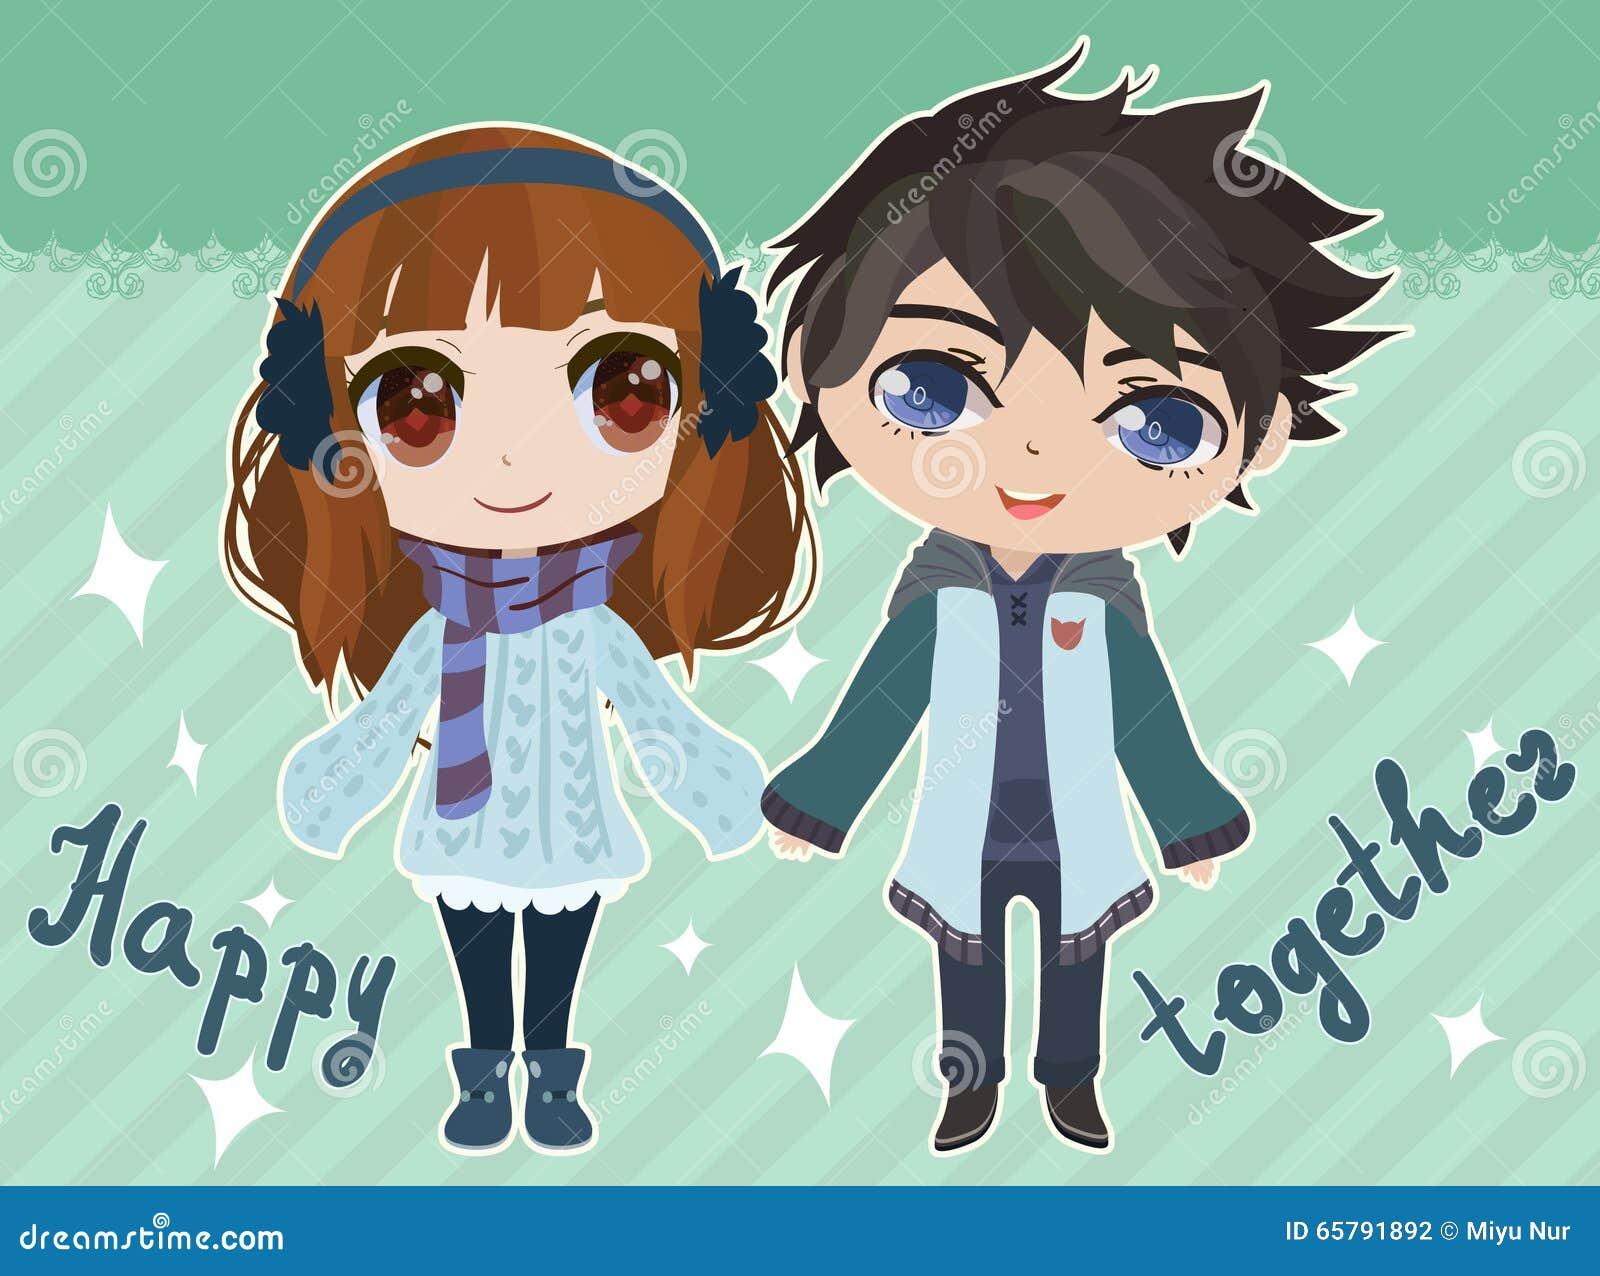 Sweet anime couple card design